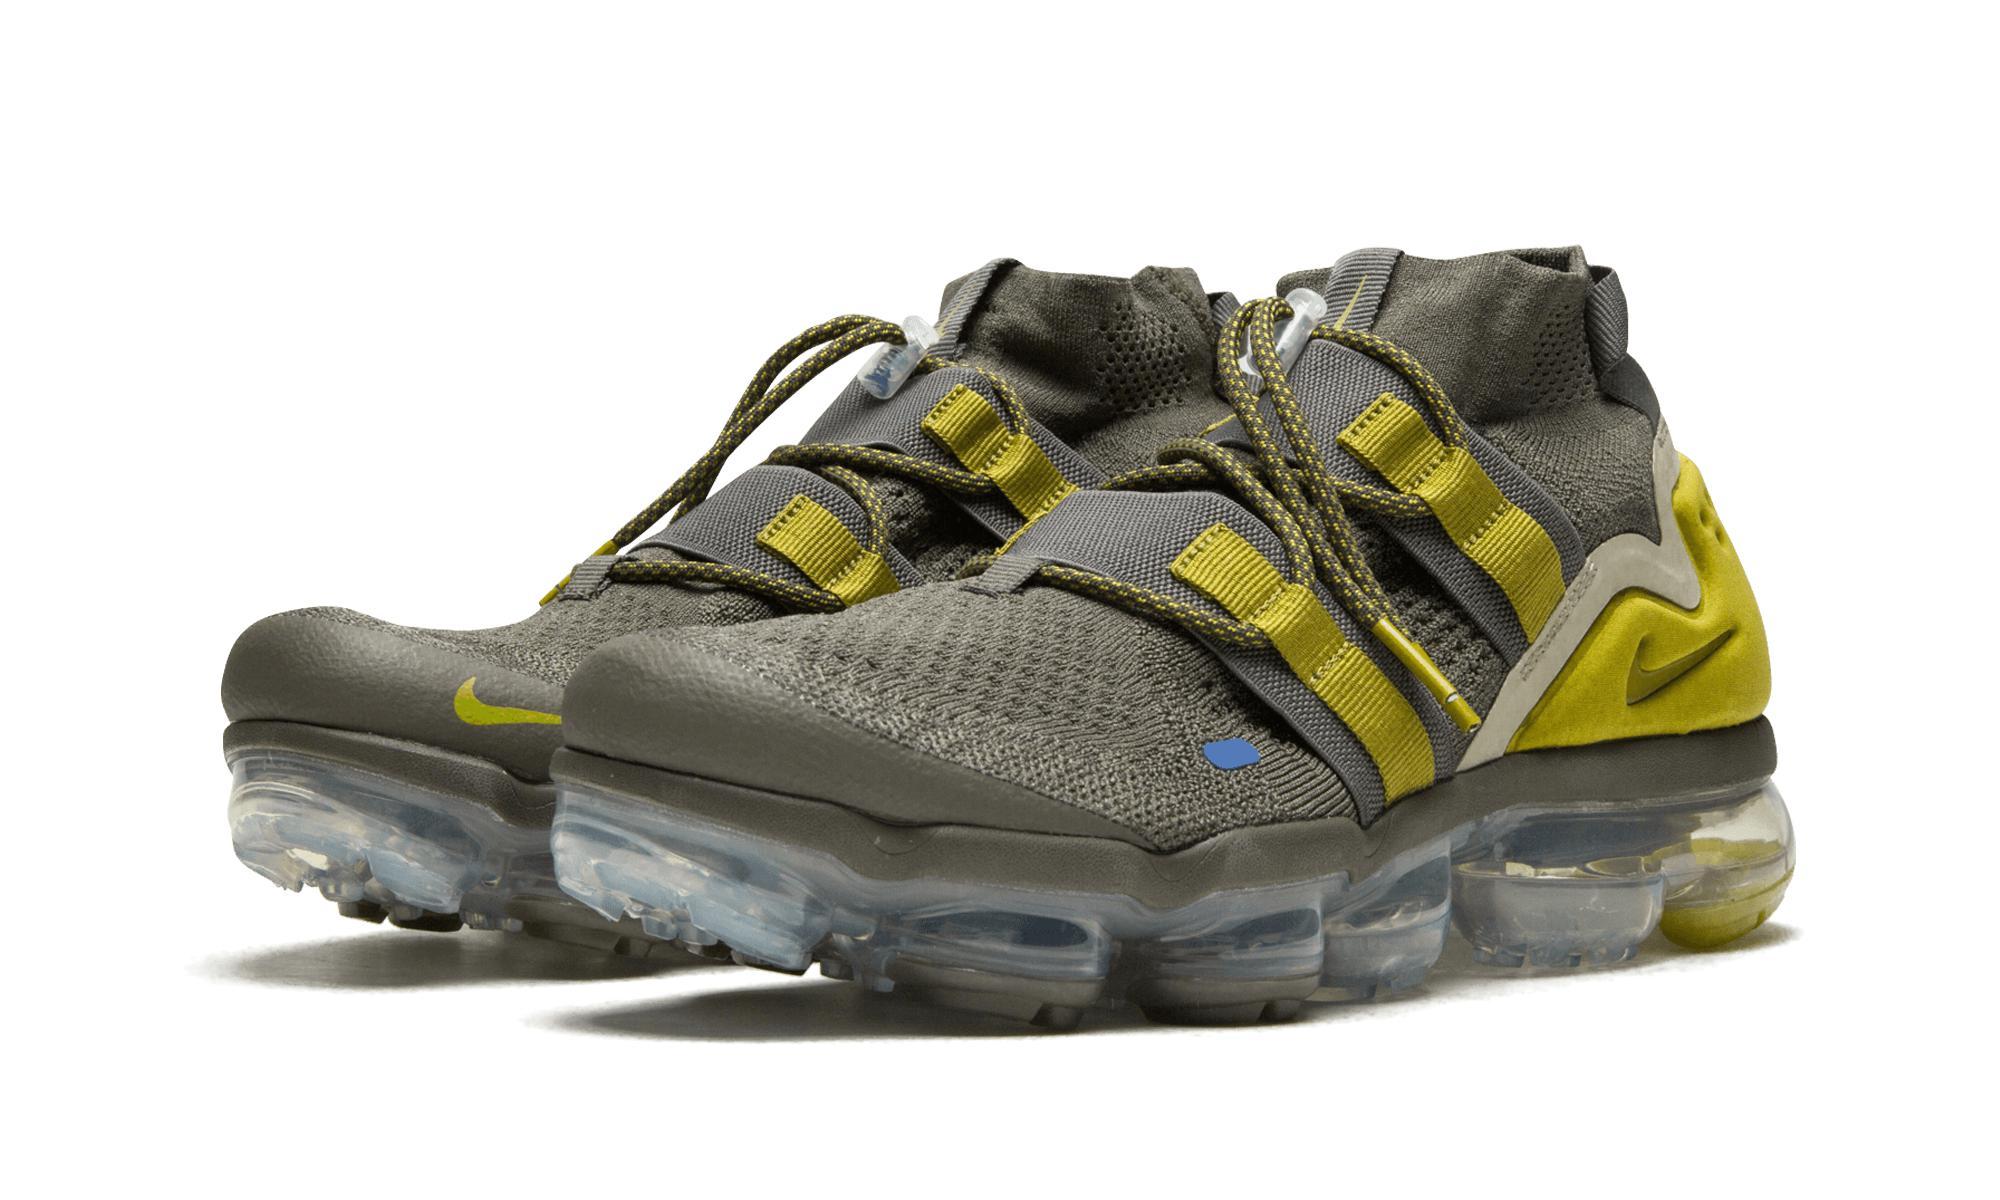 0a241fe62e6d Nike - Multicolor Air Vapormax Fk Utility for Men - Lyst. View fullscreen